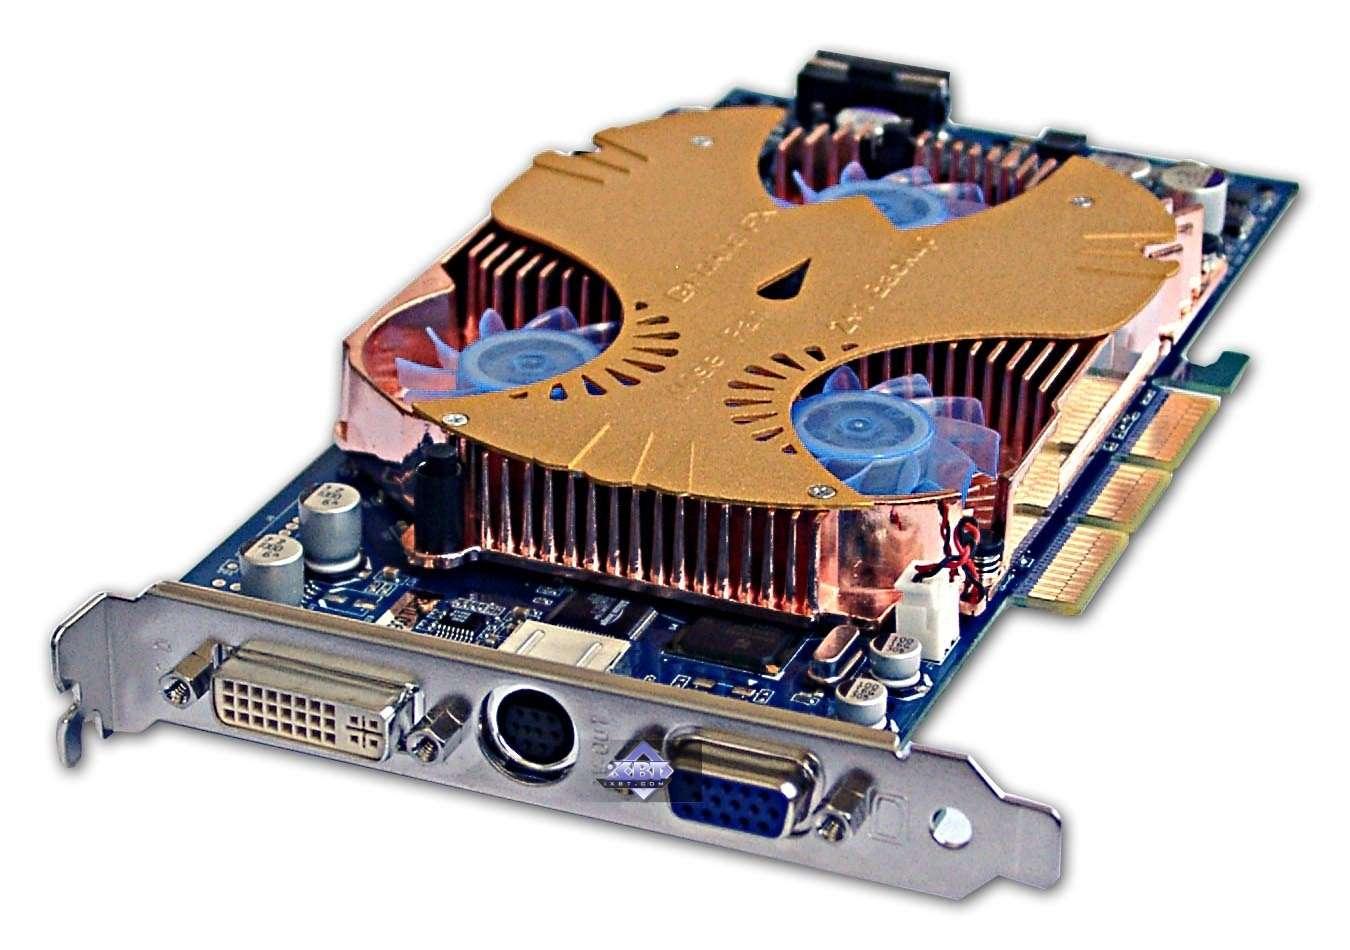 NVIDIA s GeForce FX 5900 XT GPU